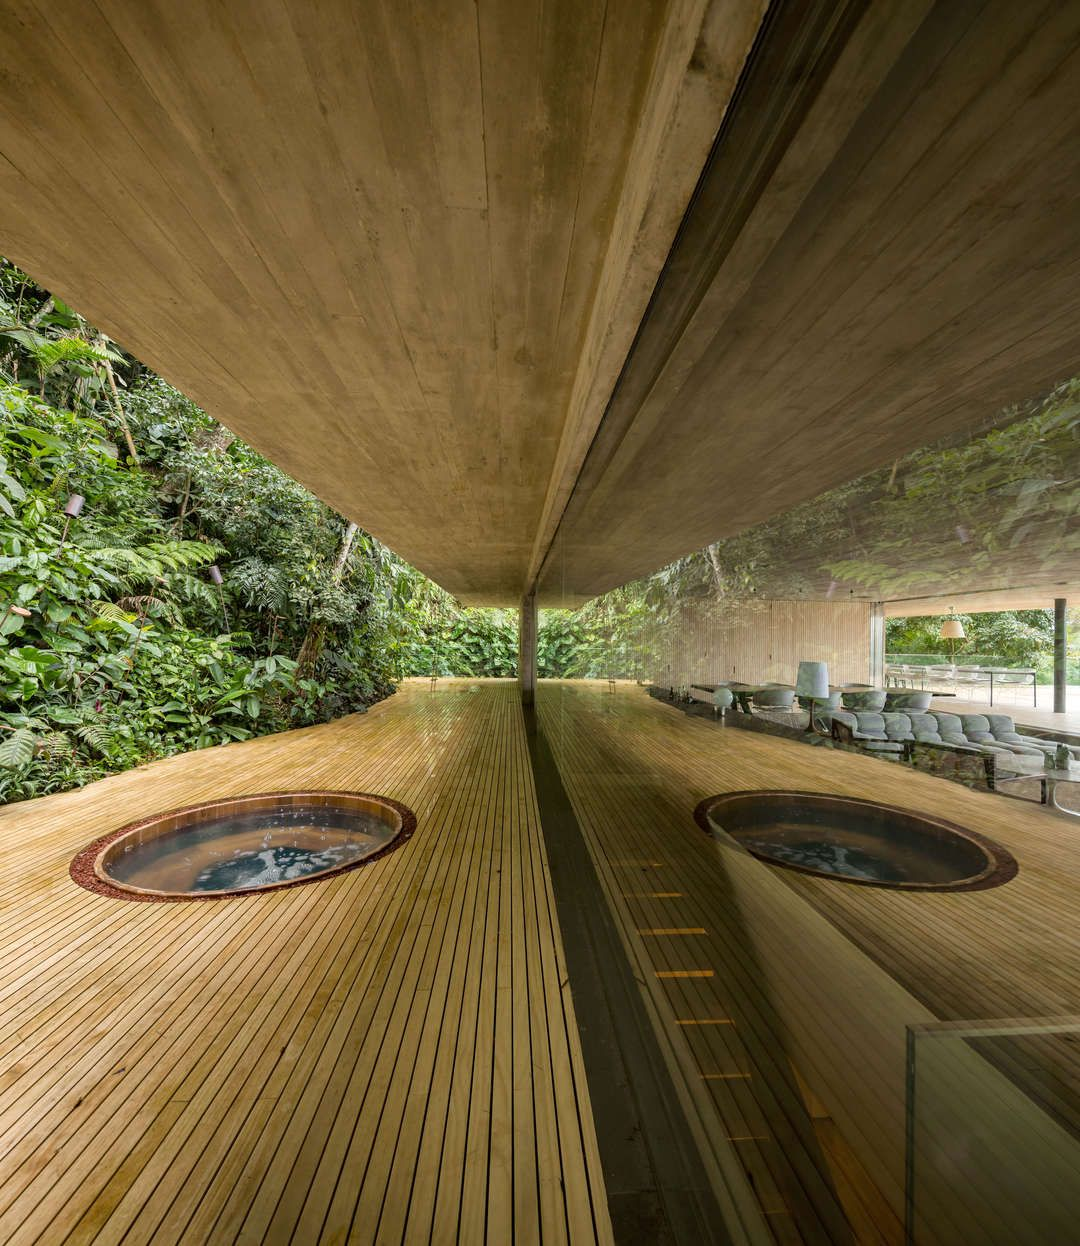 Jungle House, Guarujá, SP, Brazil | StudioMK27 - Marcio Kogan